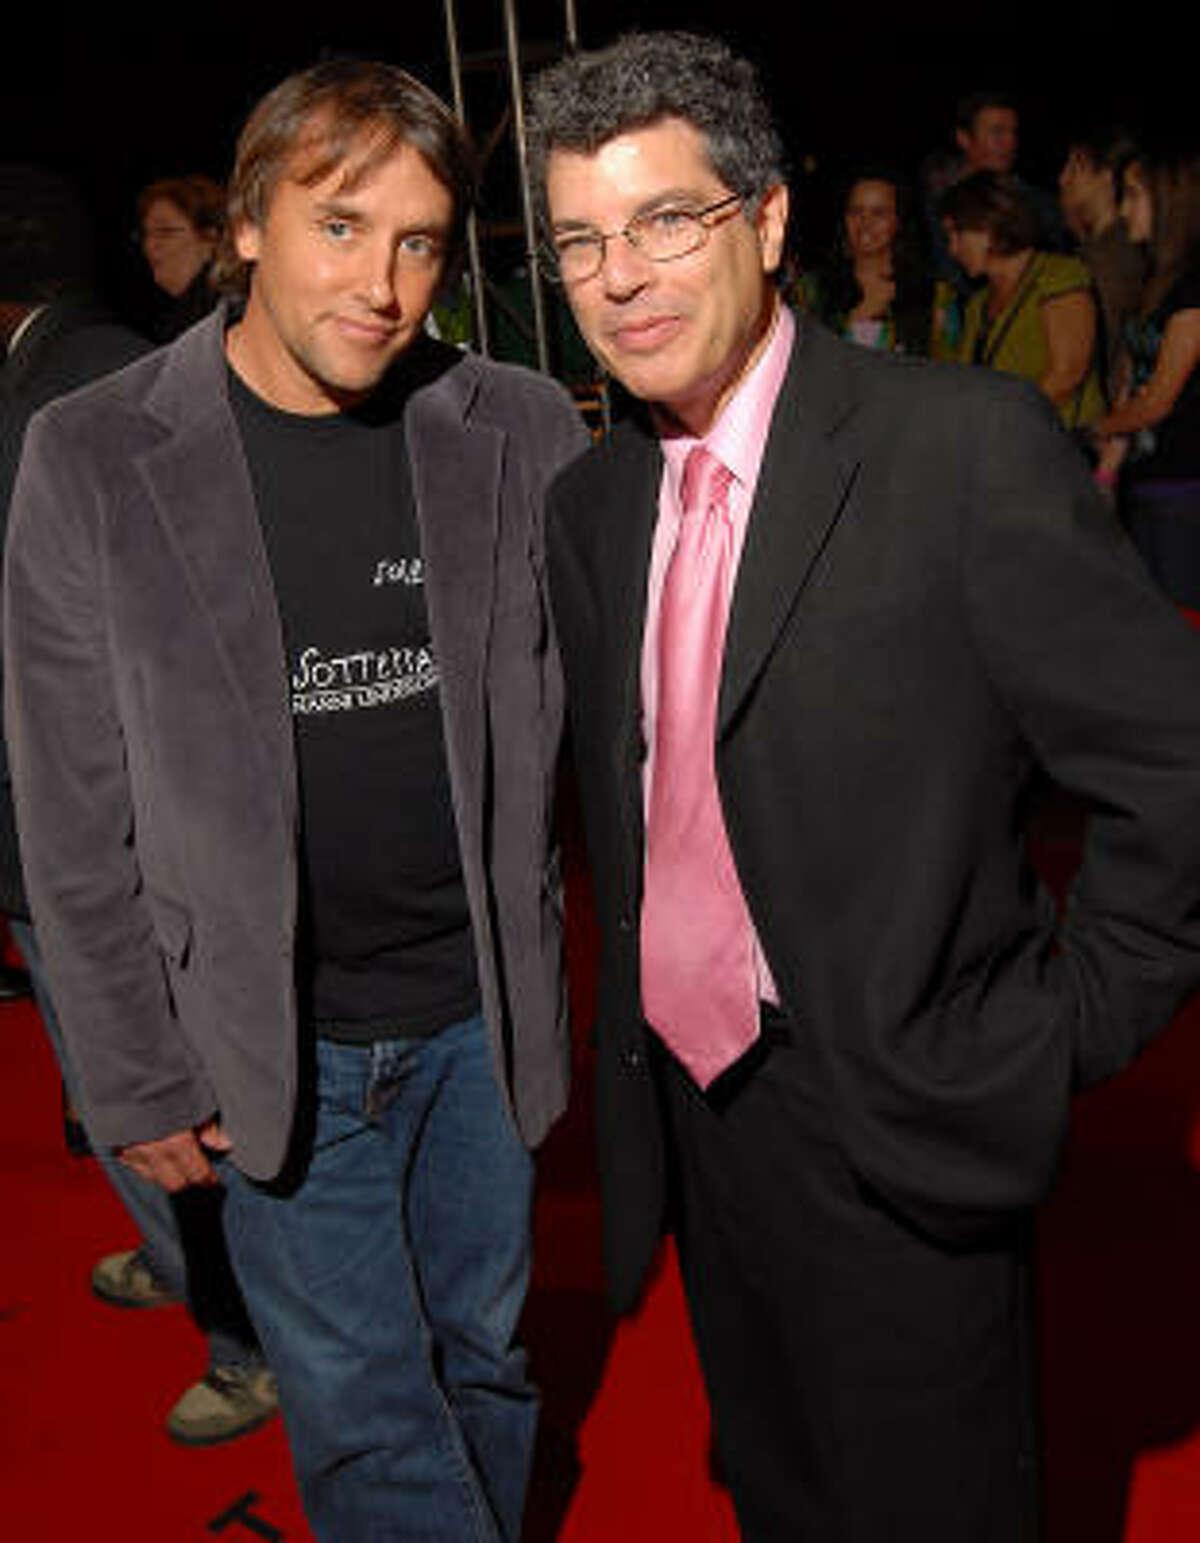 Director Richard Linklater, left, and festival curator Richard Herskowitz